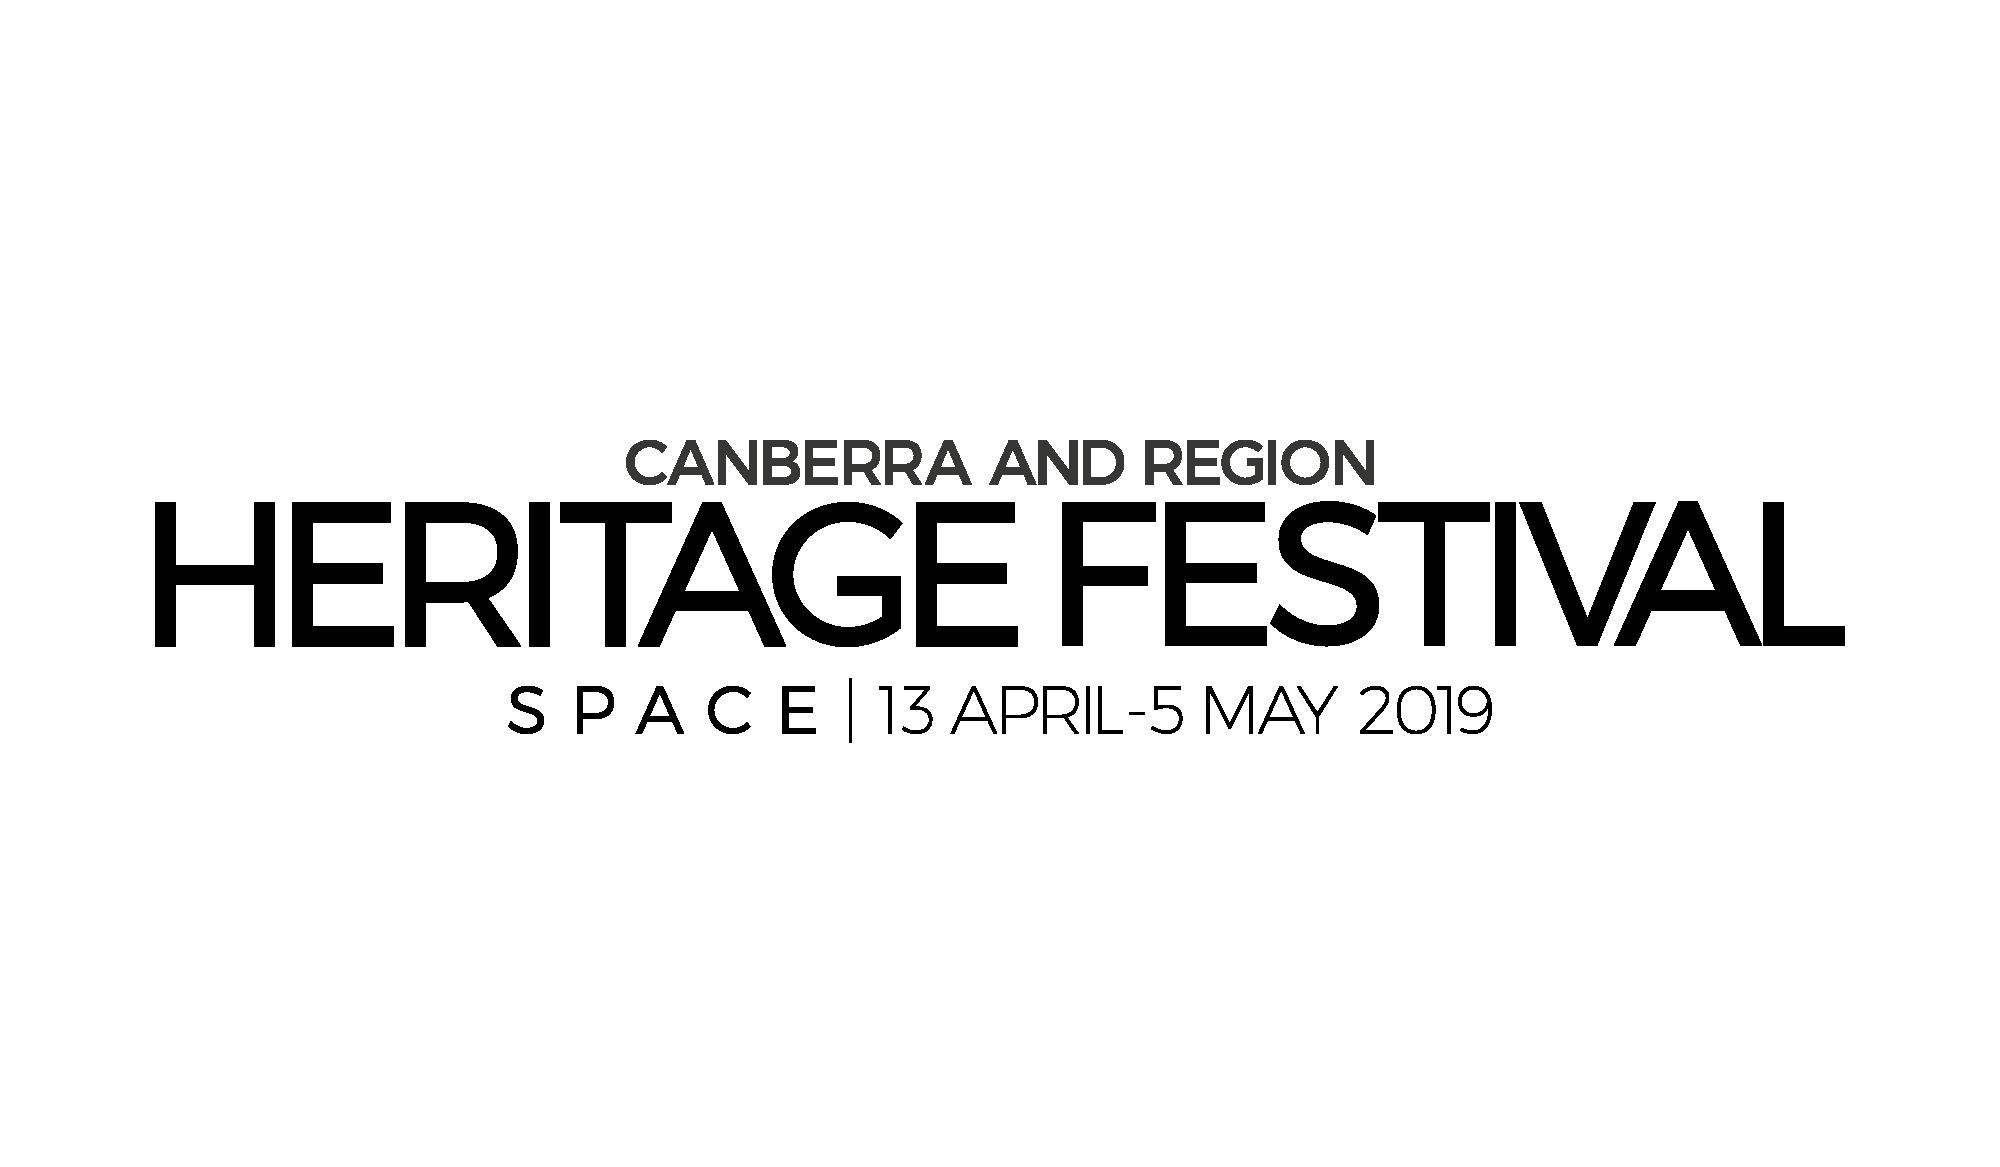 Canberra and Region Heritage Festival logo